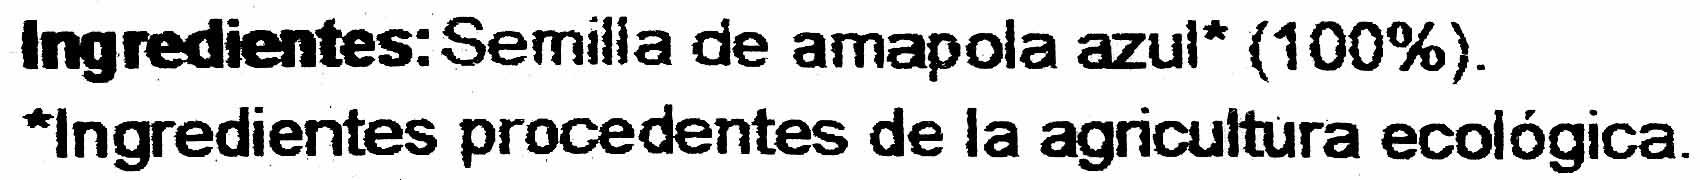 Semilla de Amapola - Ingredients